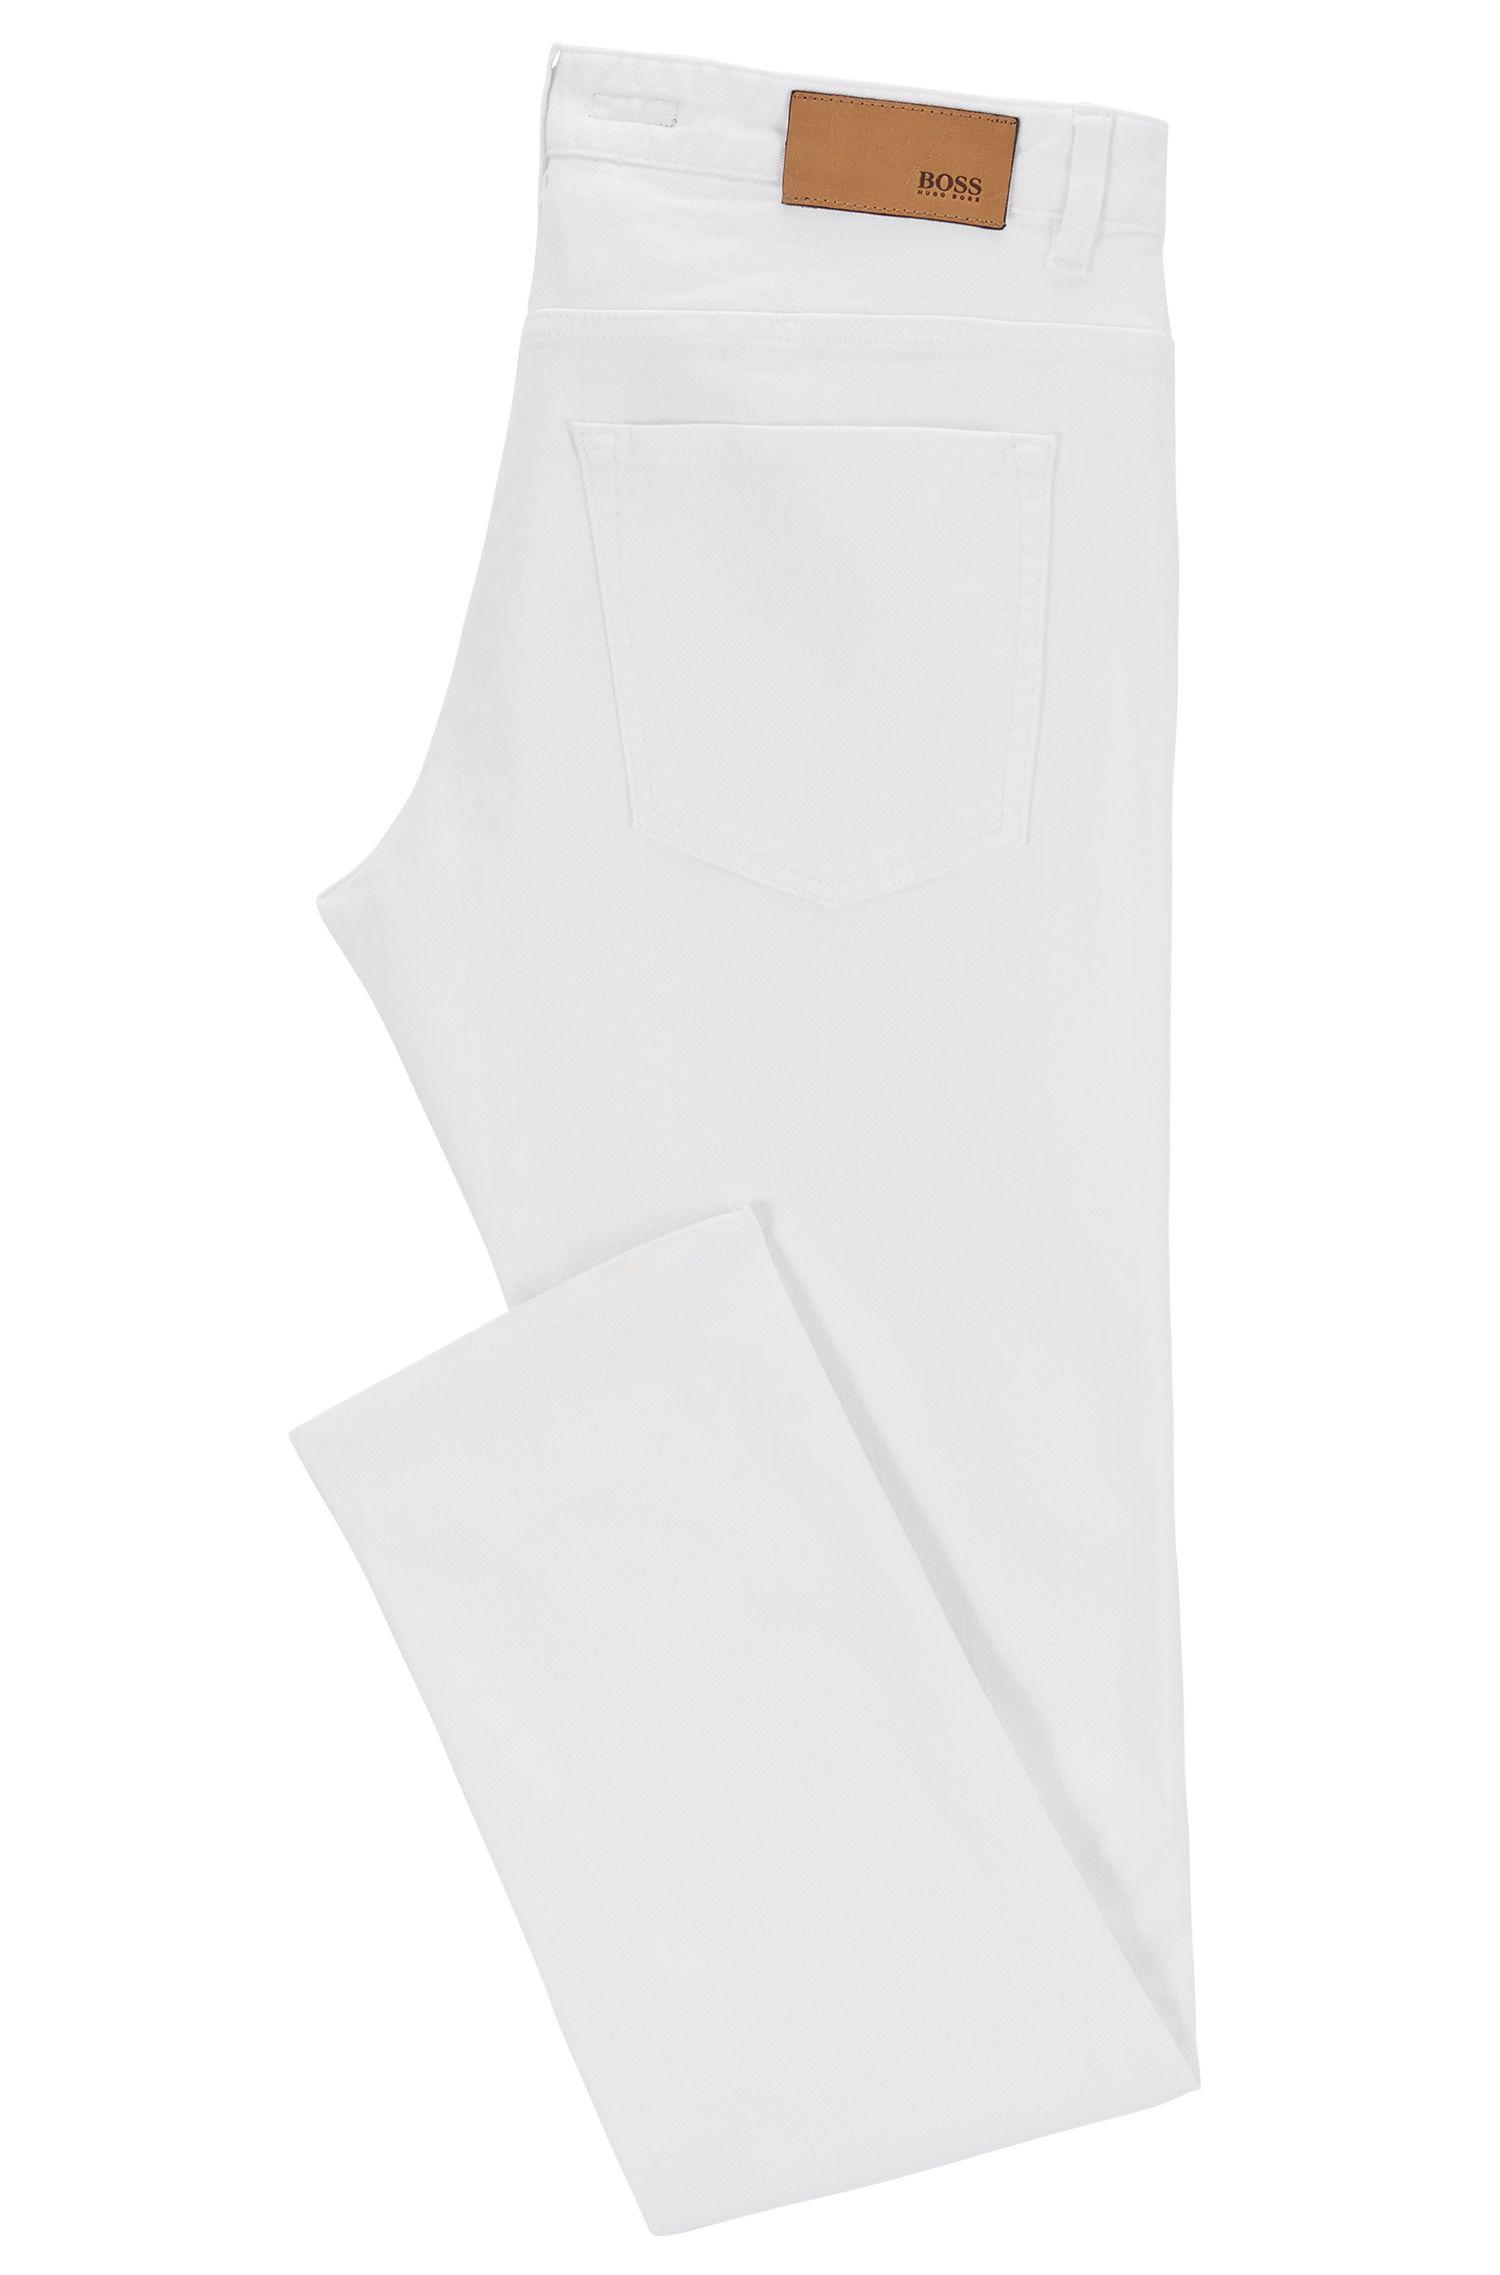 Stretch Cotton Jean, Slim Fit | Delaware, Natural